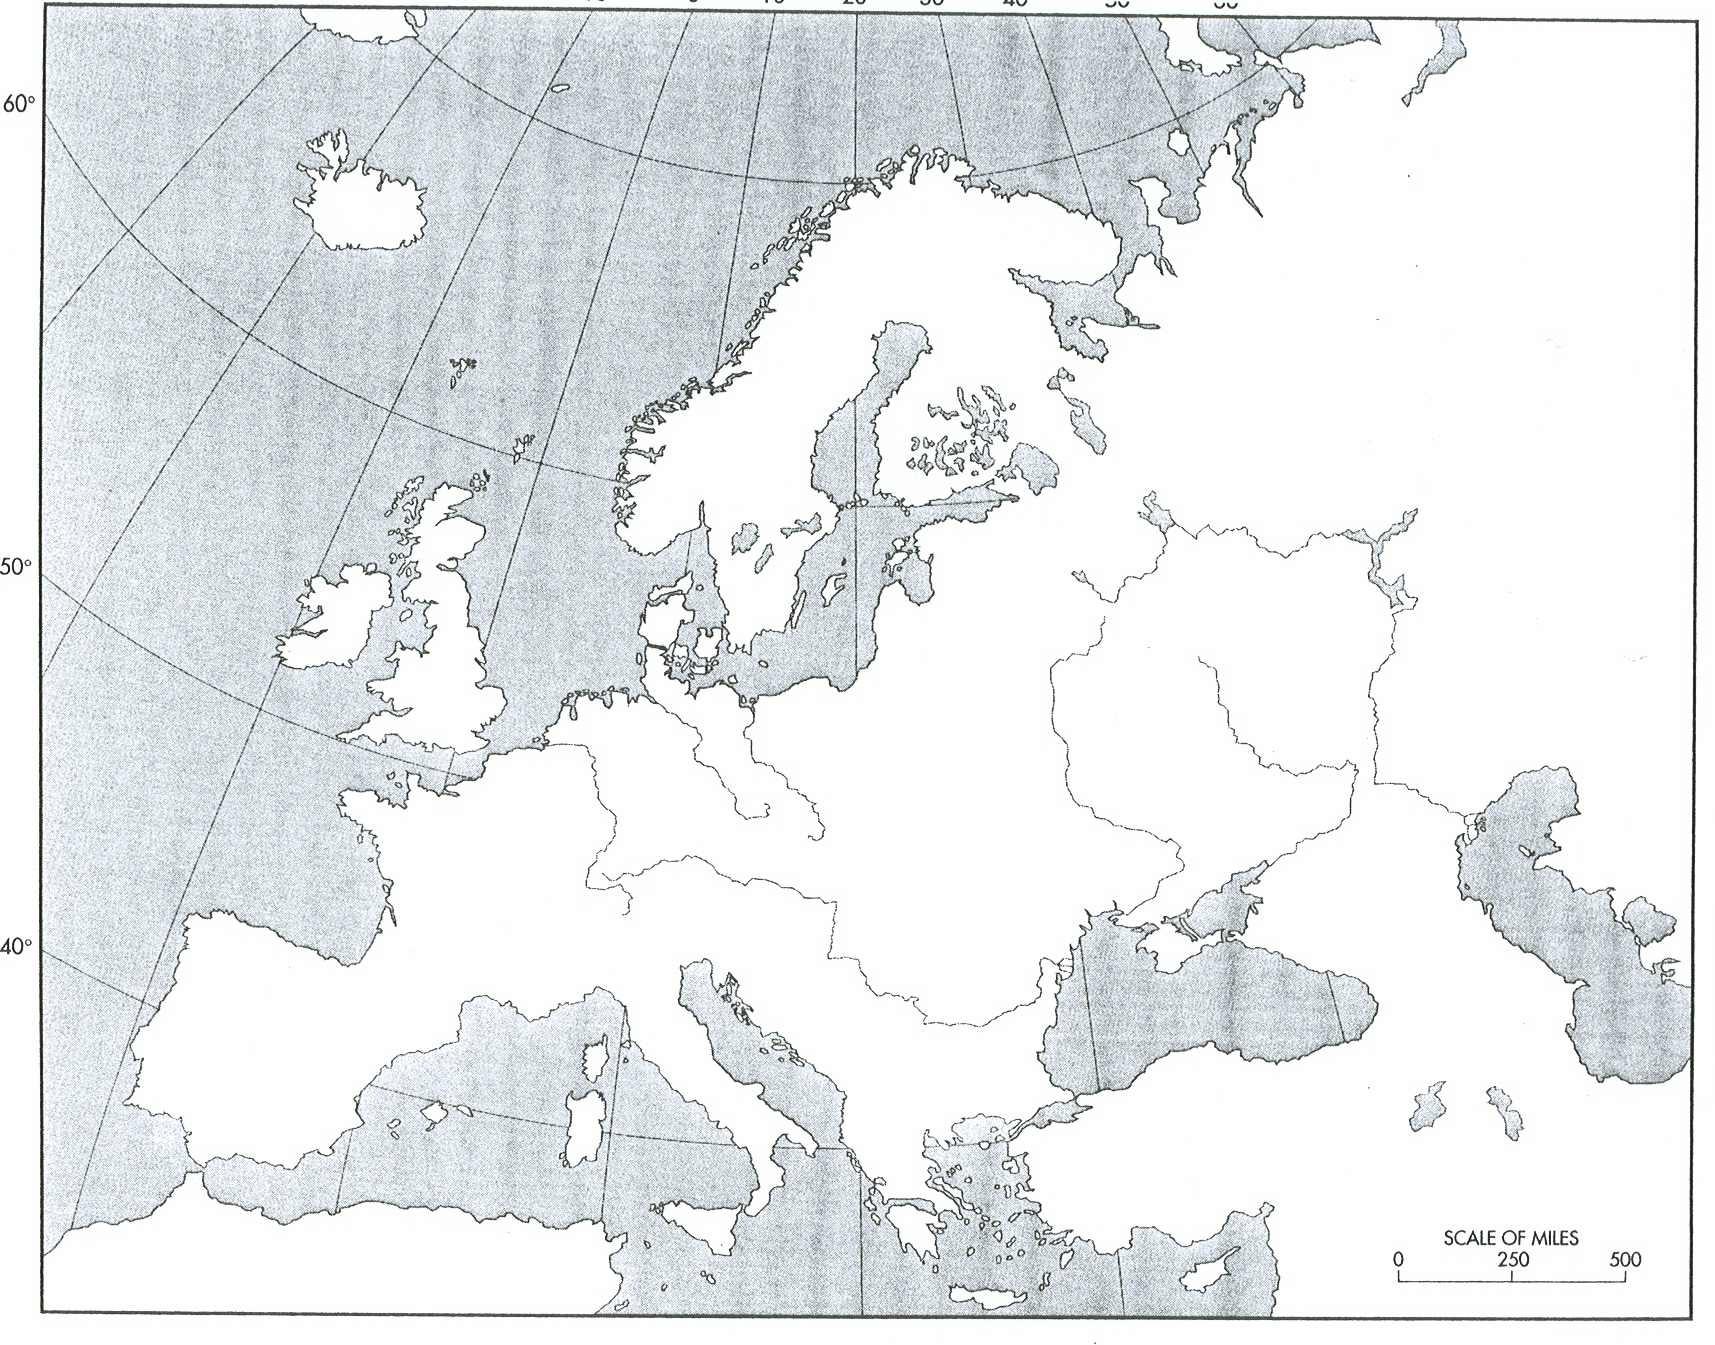 History 464: Europe Since 1914 (UNLV)